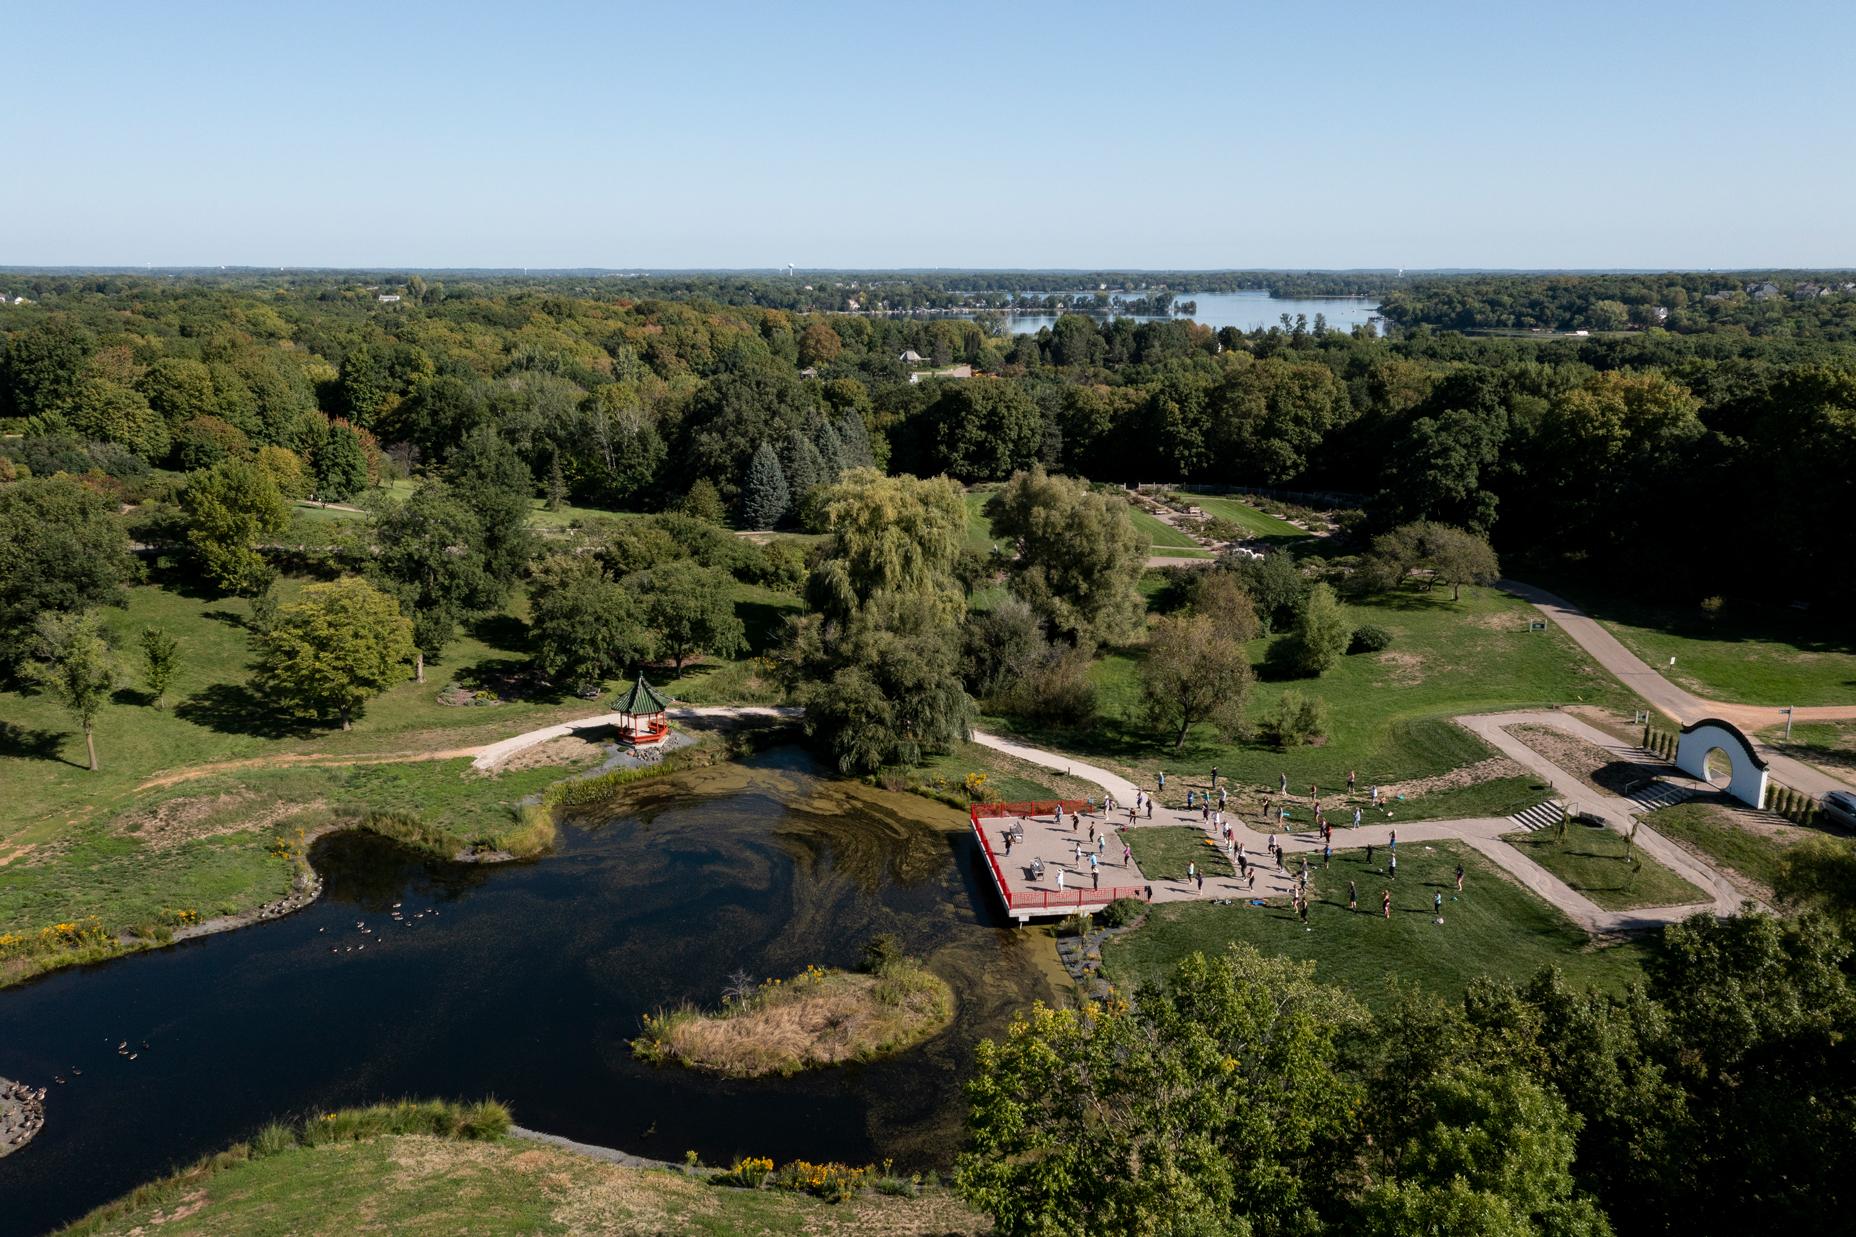 Aerial view of the Arboretum in Chanhassen Minnesota